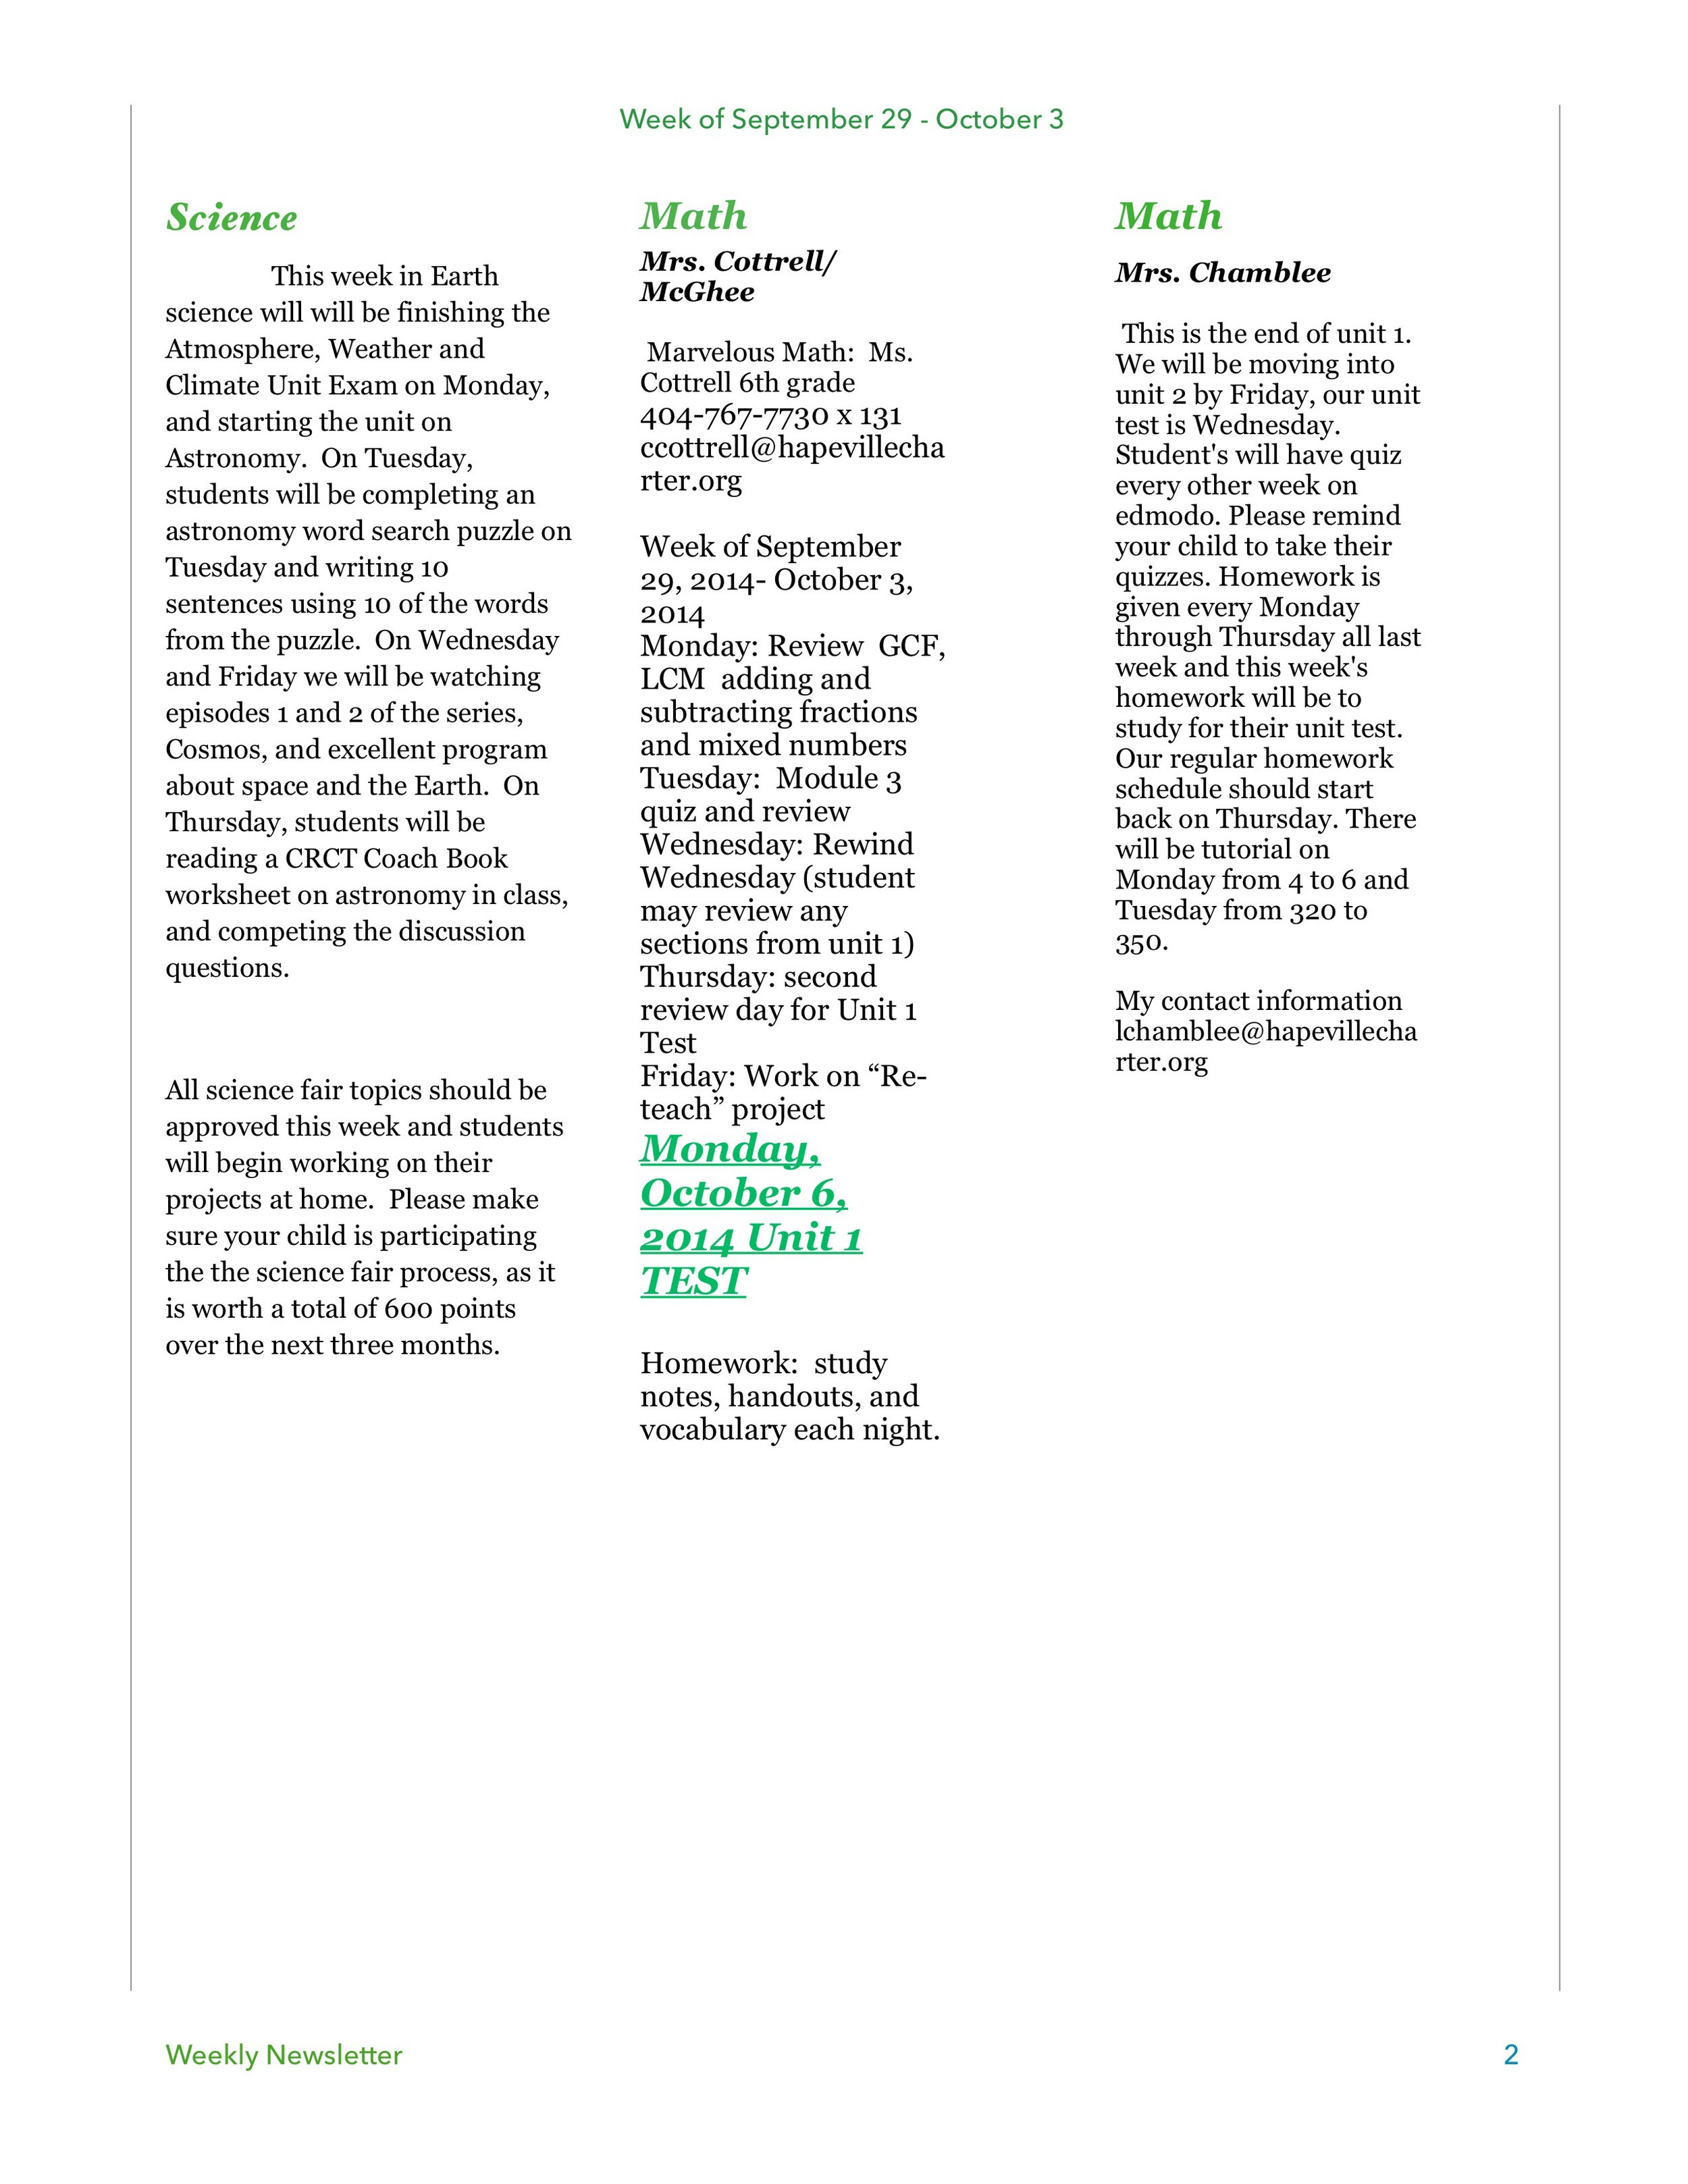 Newsletter Image6th grade 9-29 2.jpeg